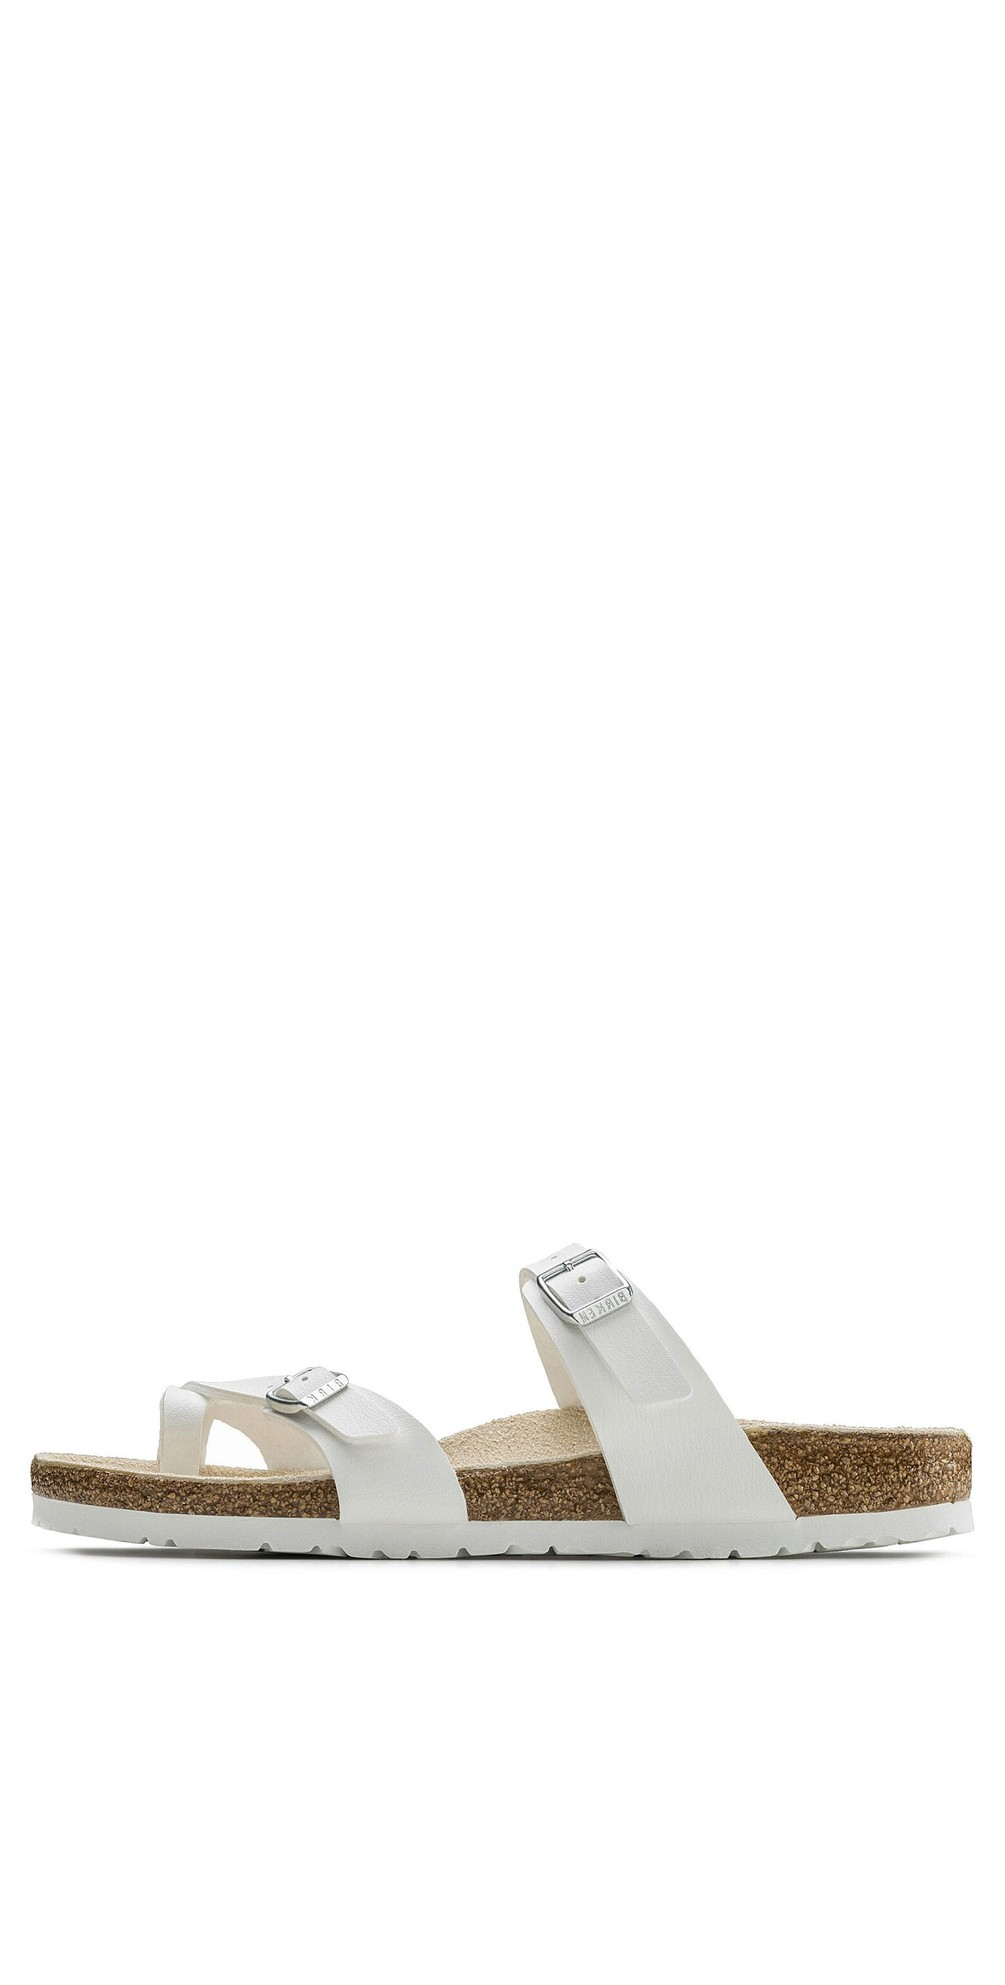 Mayari Birko-Flor Sandals main image